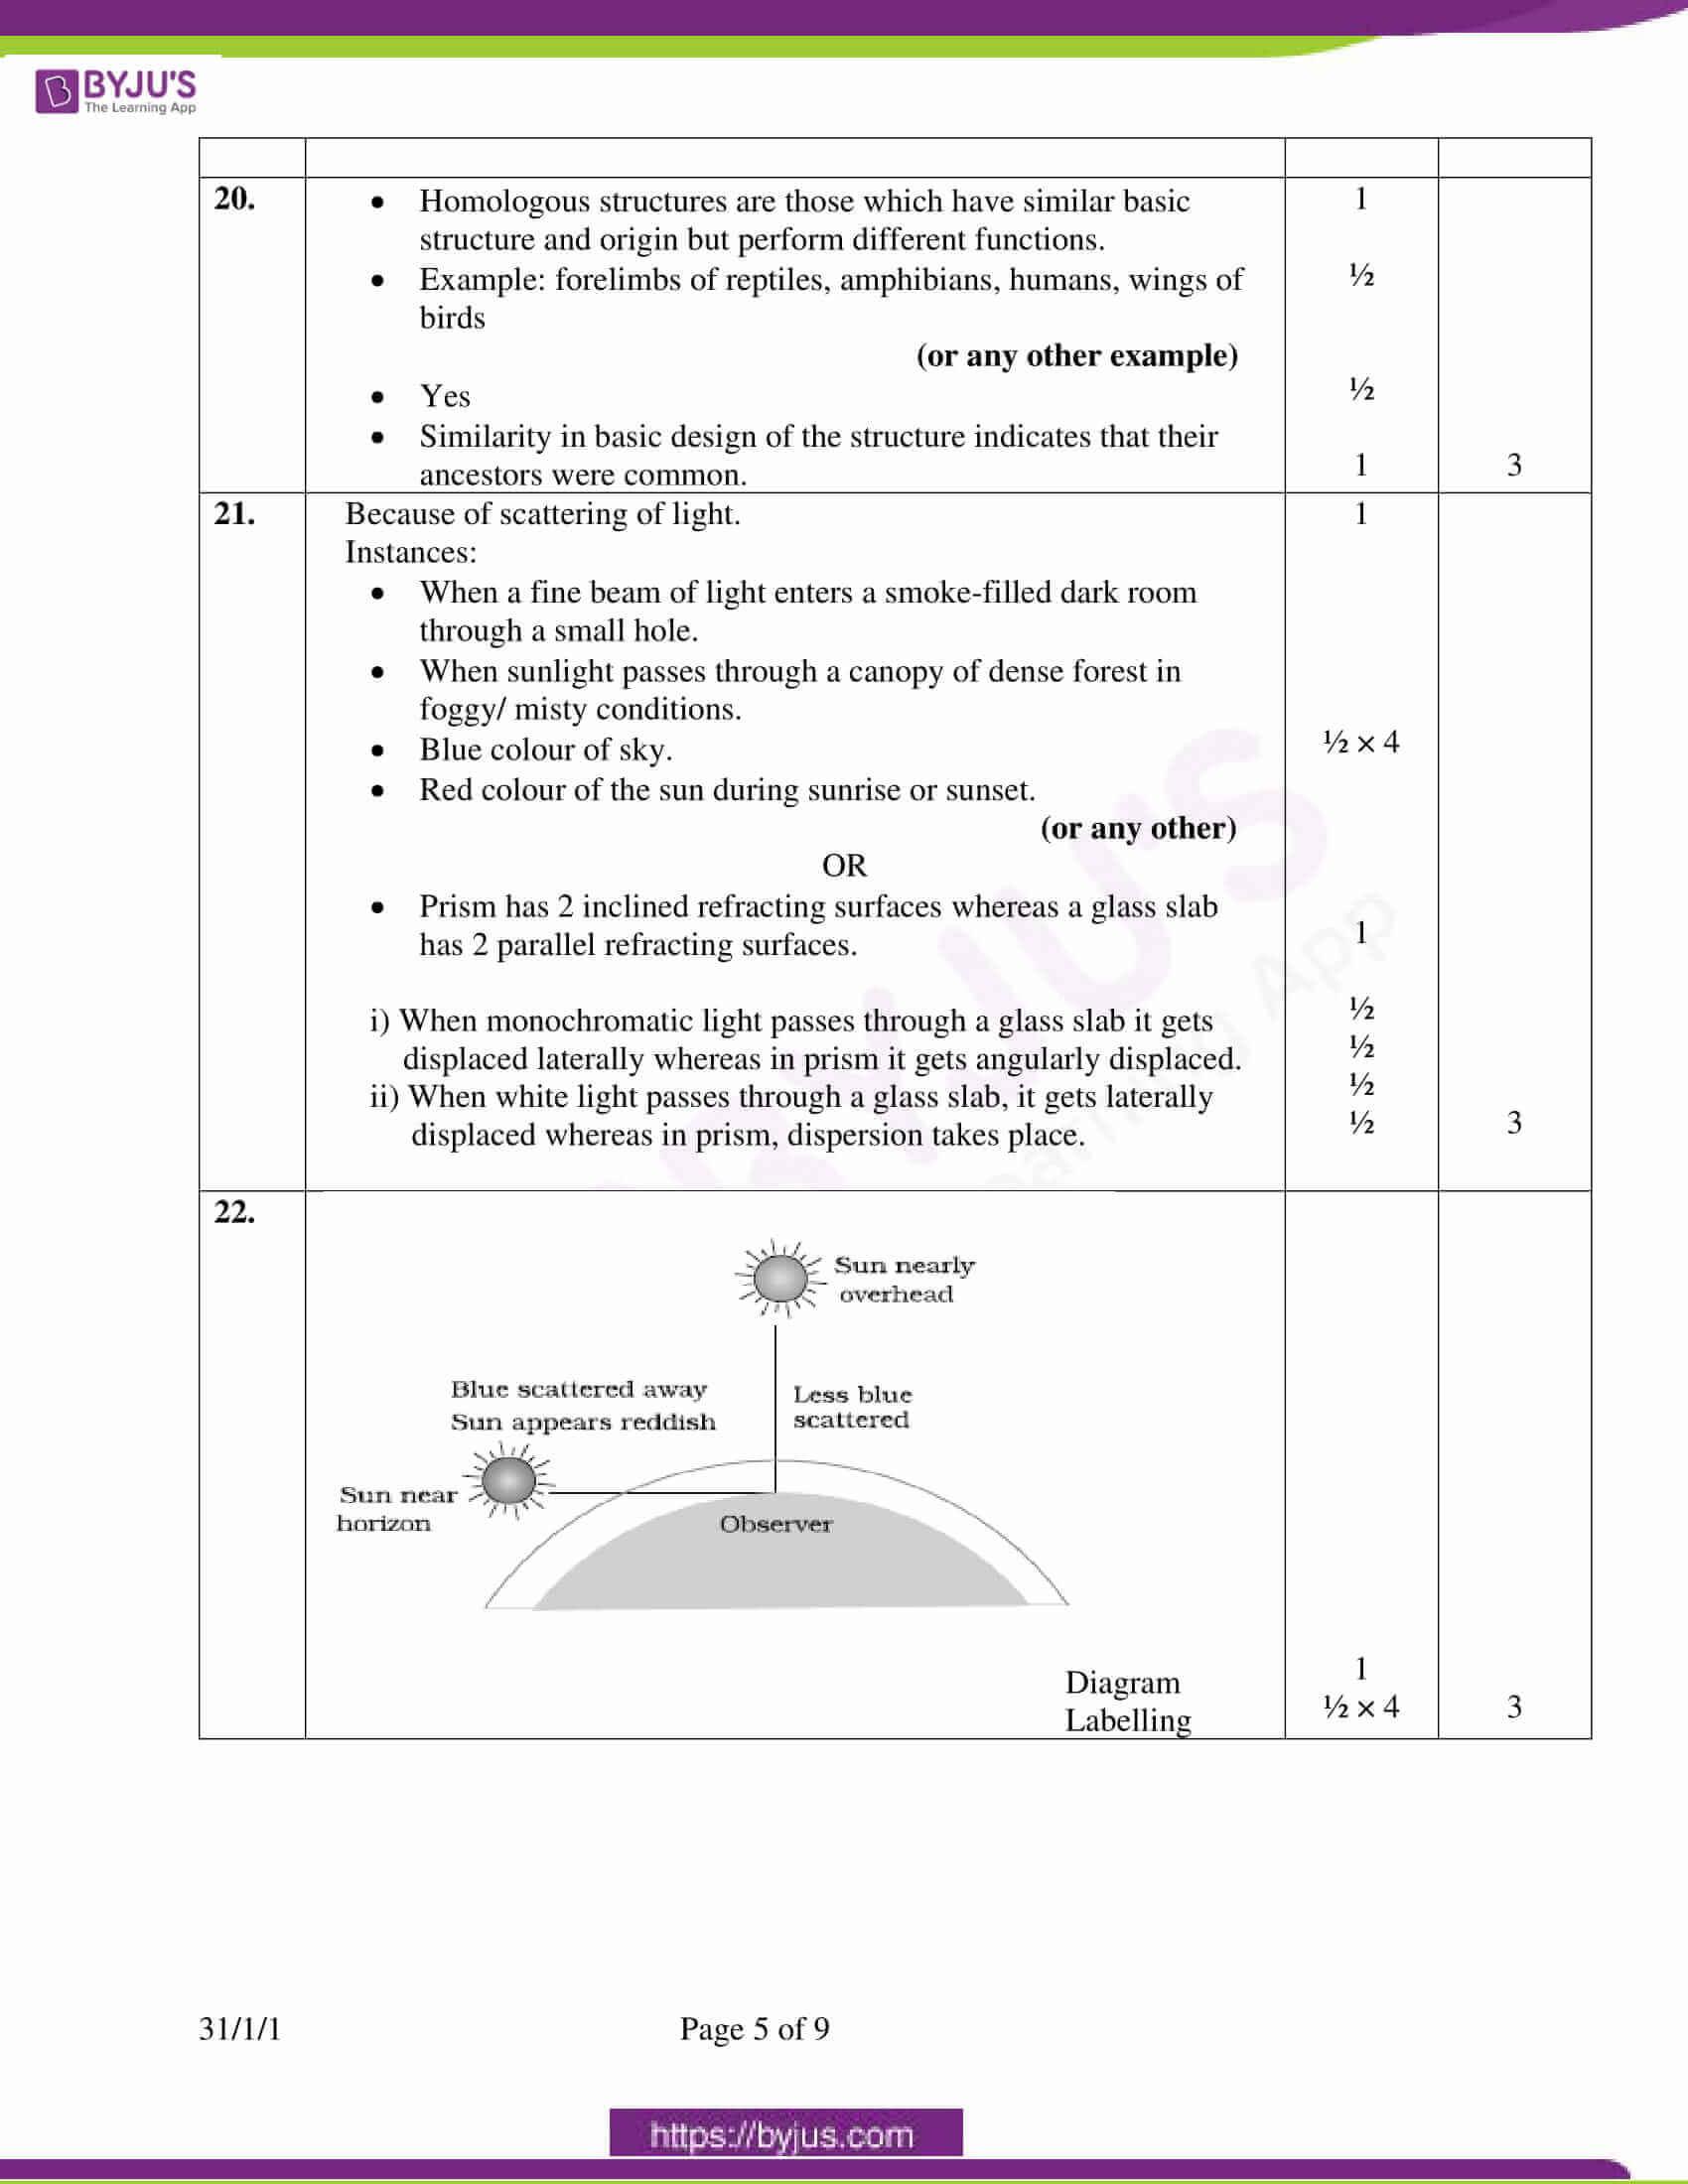 cbse class 10 science question paper set 3 solution 2020 3